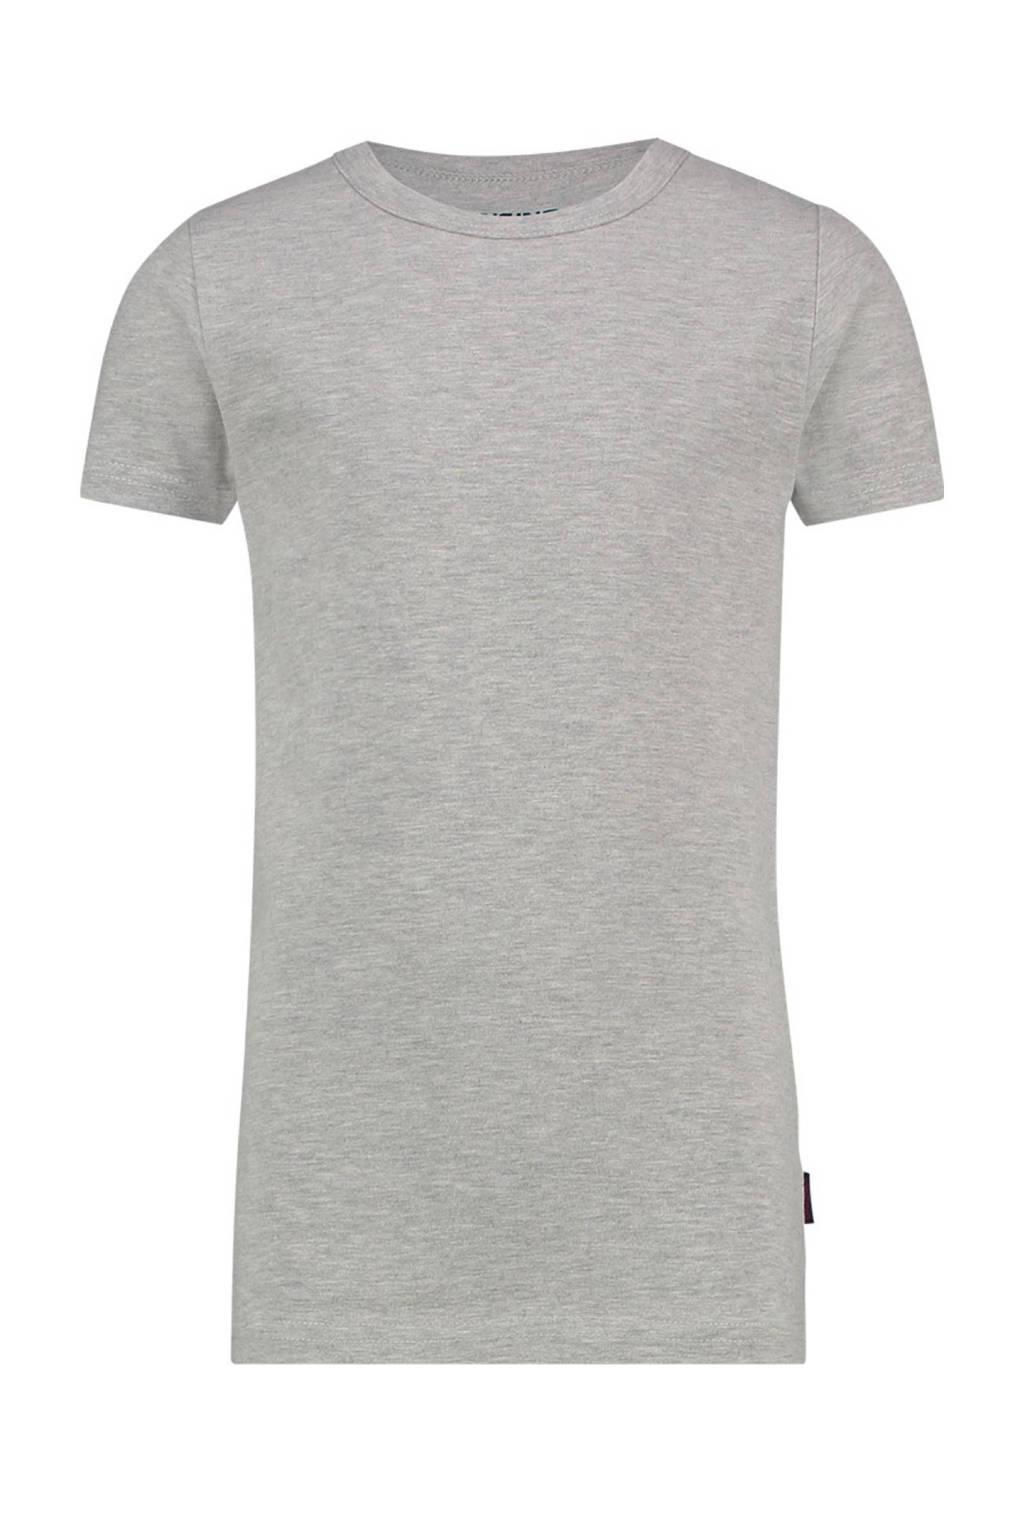 Vingino T-shirt grijs melange, Grijs melange